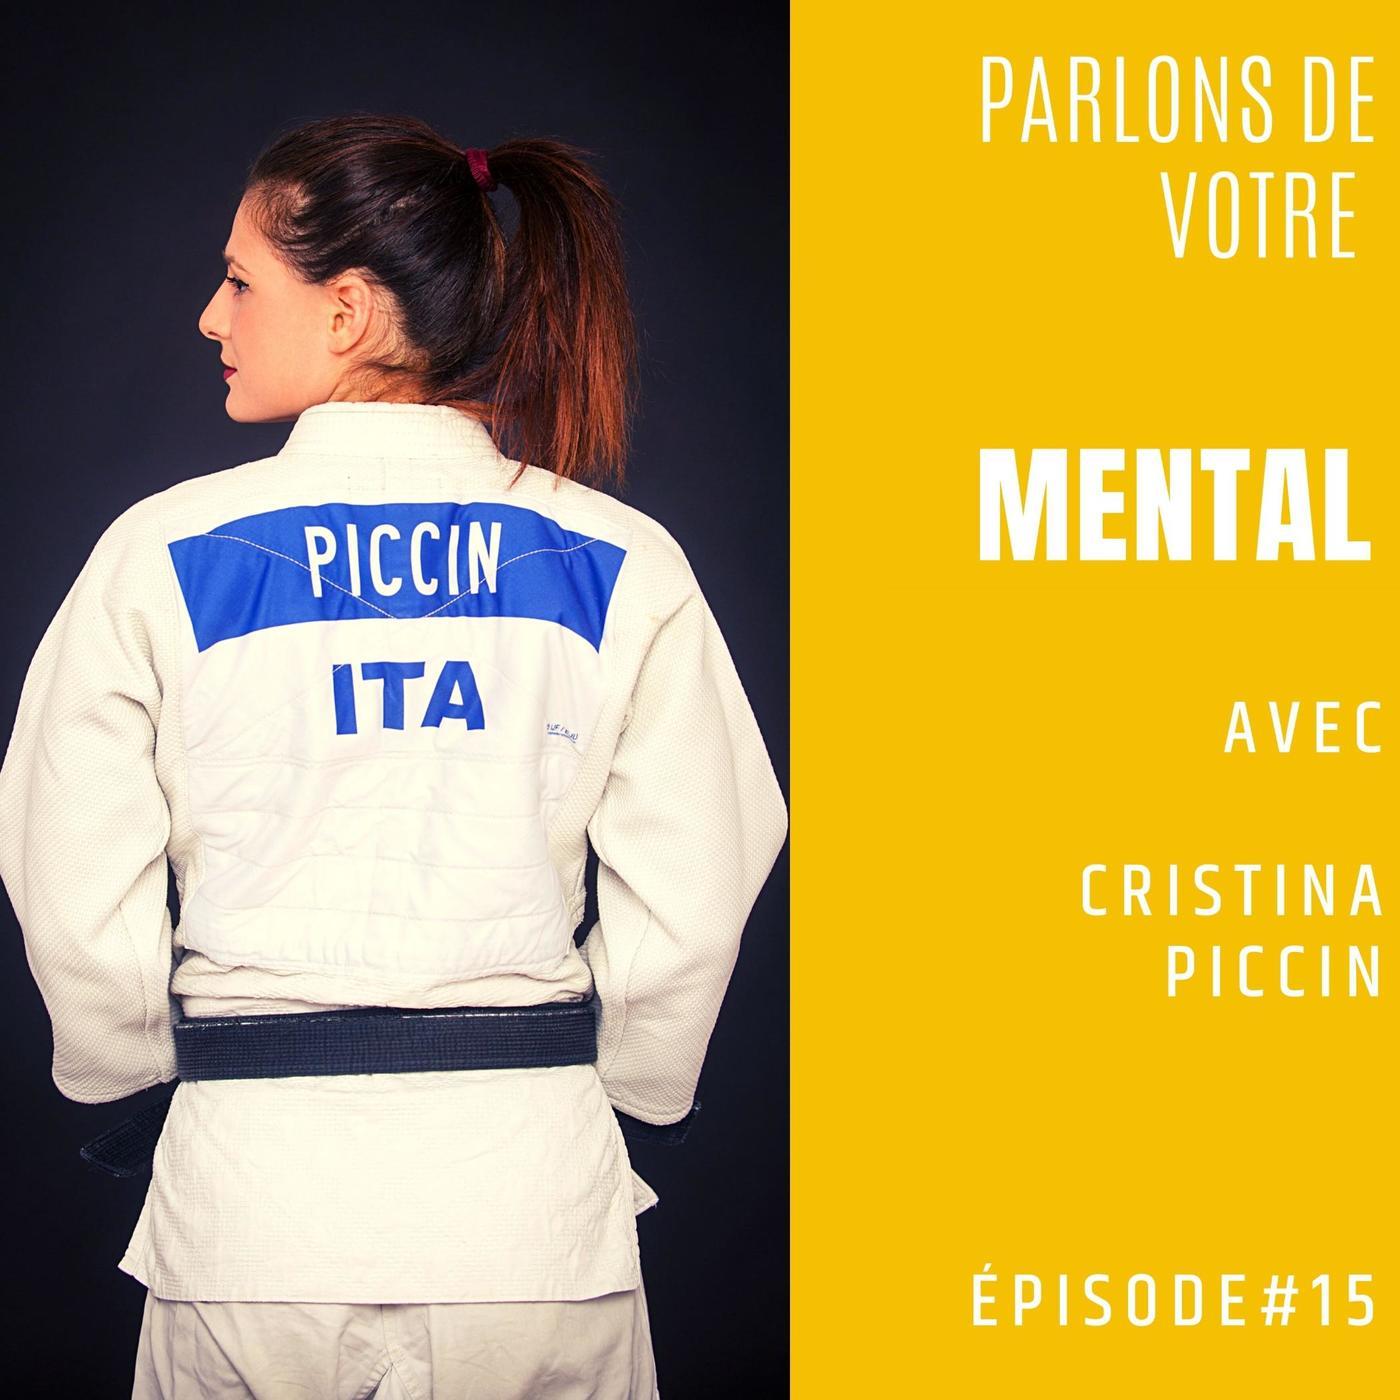 Cristina Piccin - Athlète Franco Italienne - Judokate